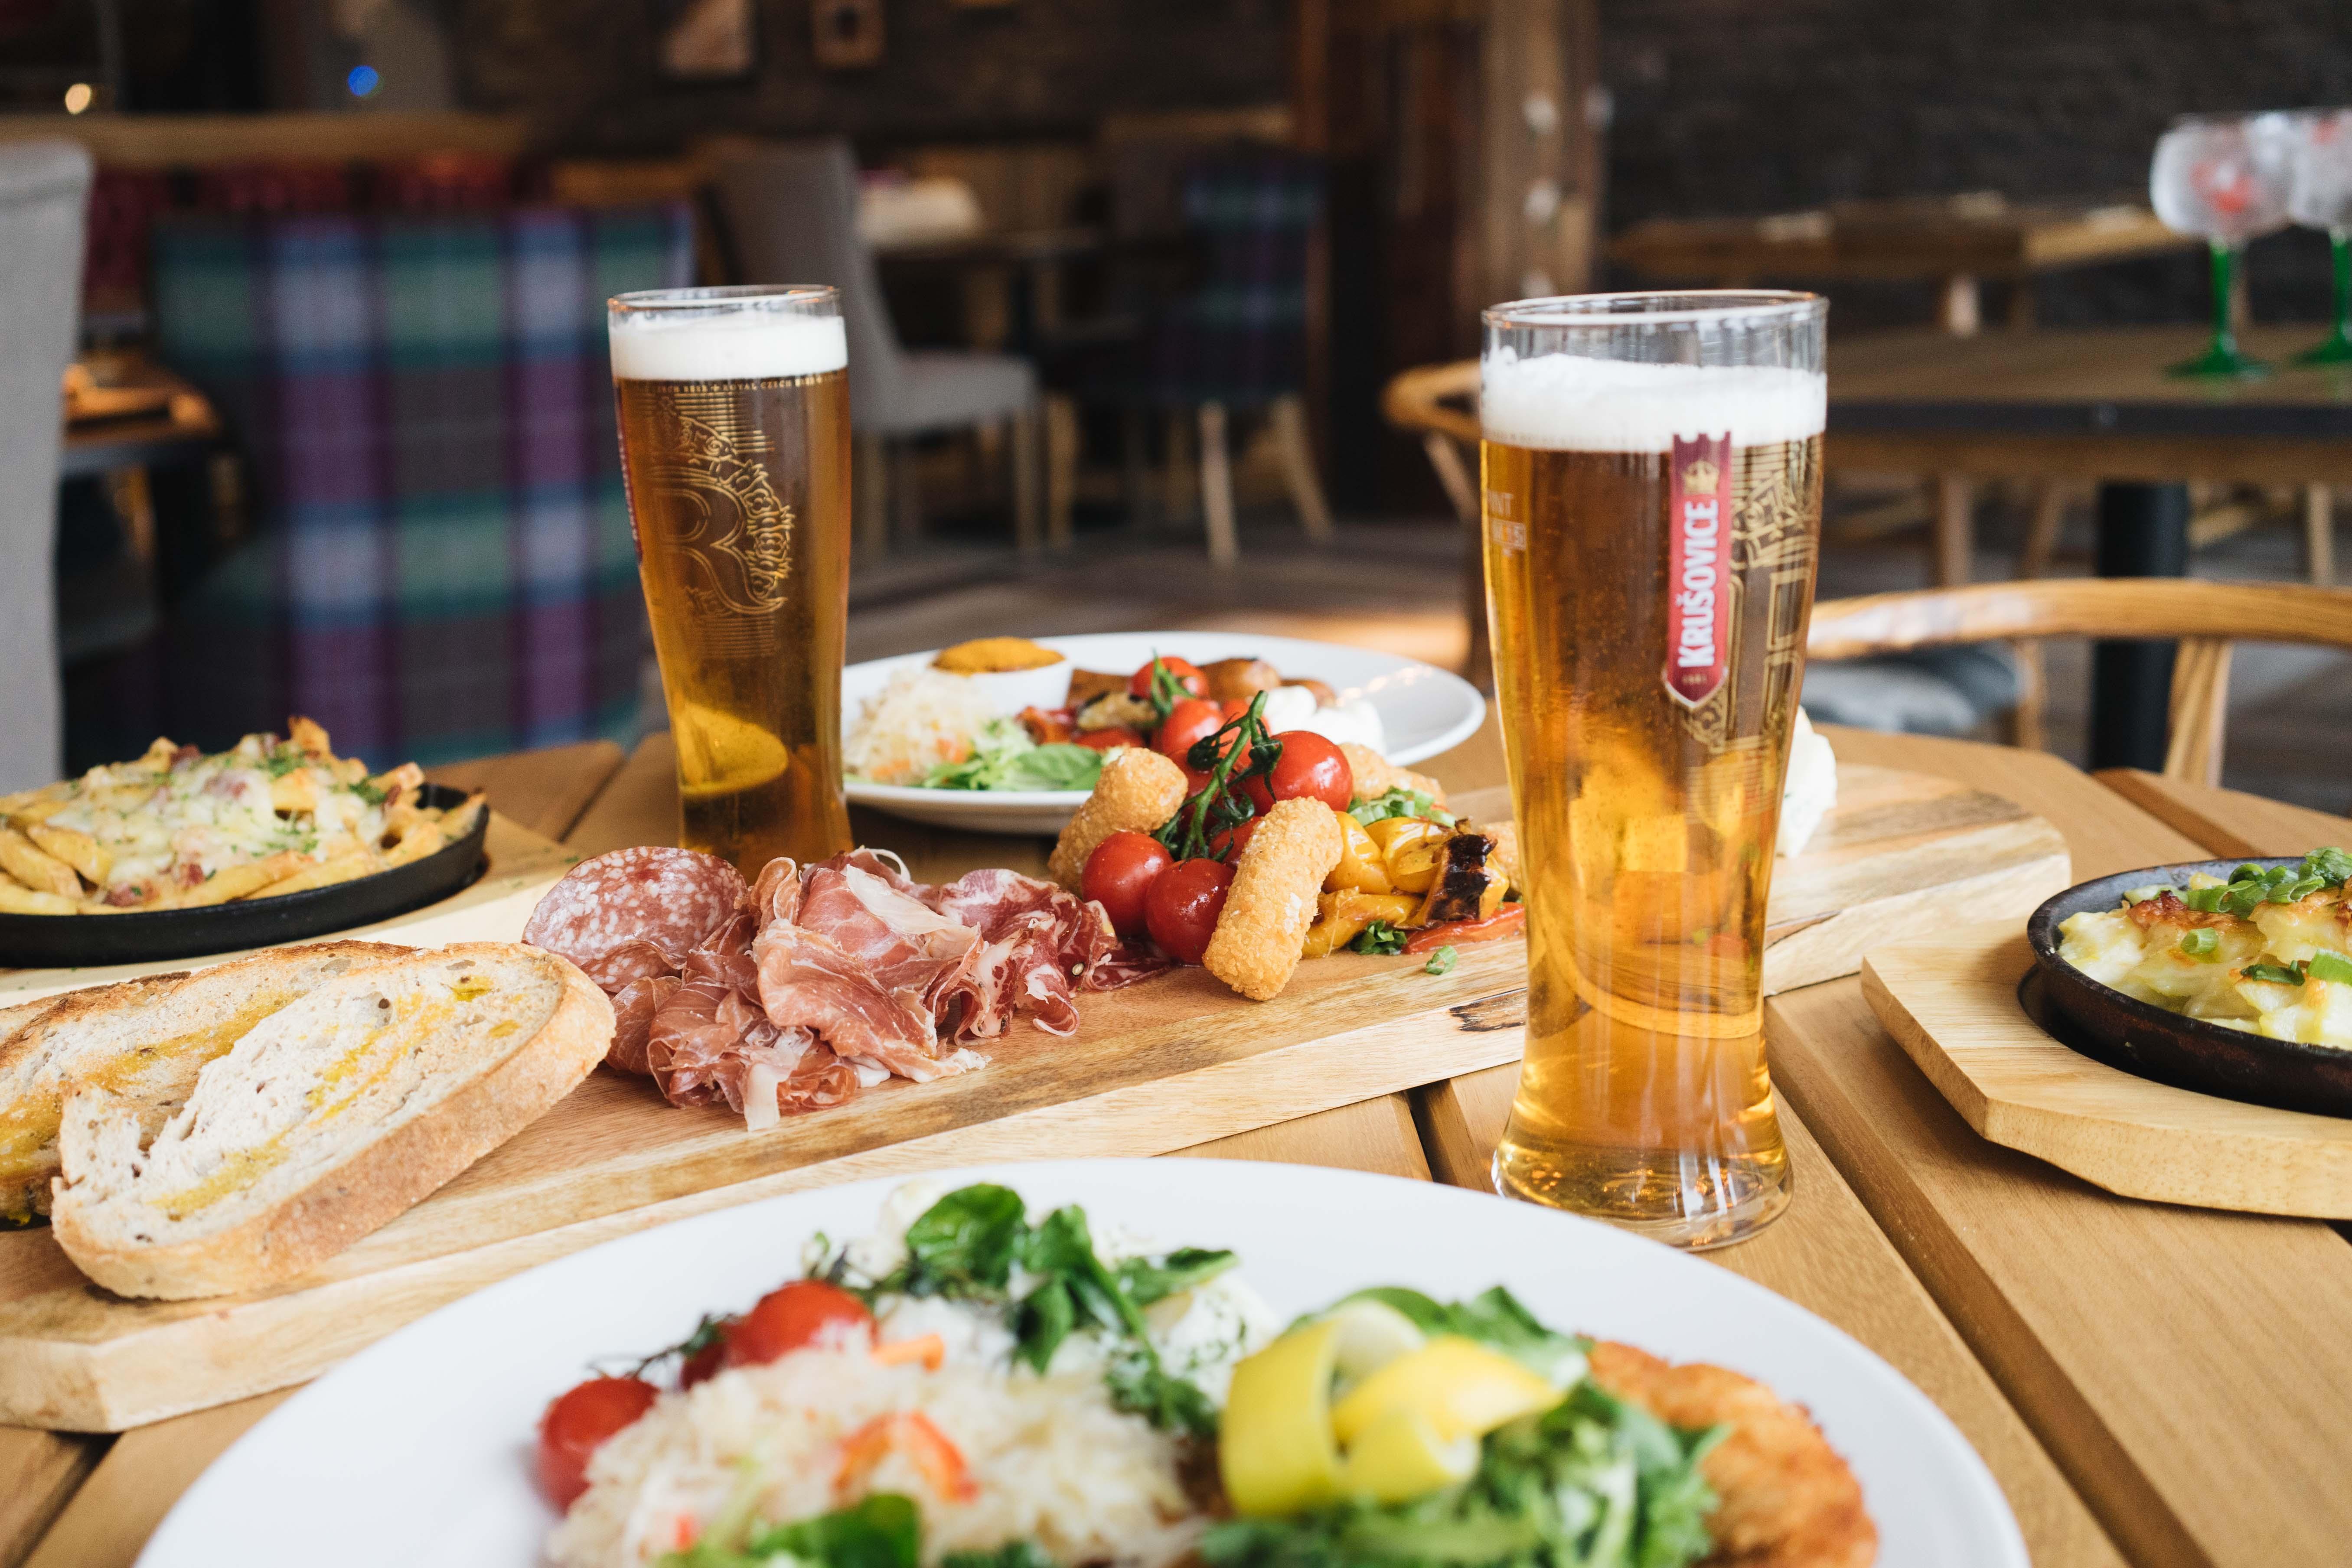 Antler Newcastle   Ski Chalet Bar   Food and Drink, Events & Karaoke Space   Launch Night   Elle Blonde Luxury Lifestyle Destination Blog